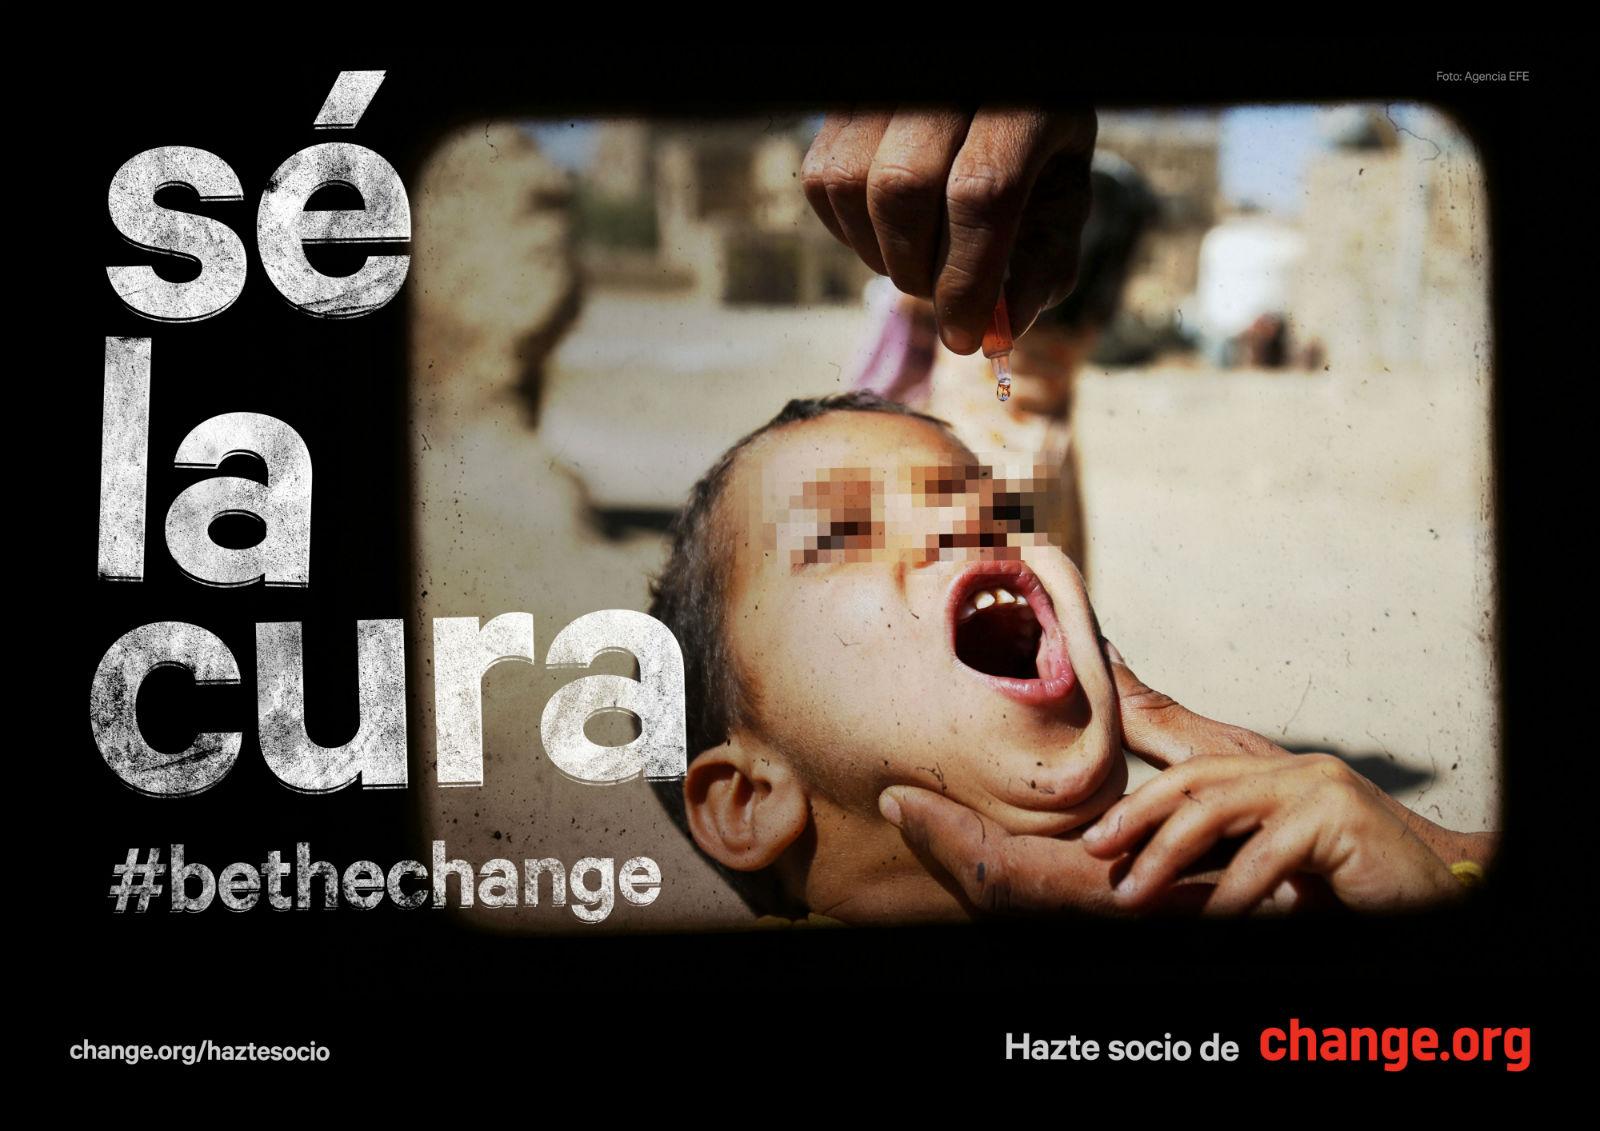 Change.org cura gráfica